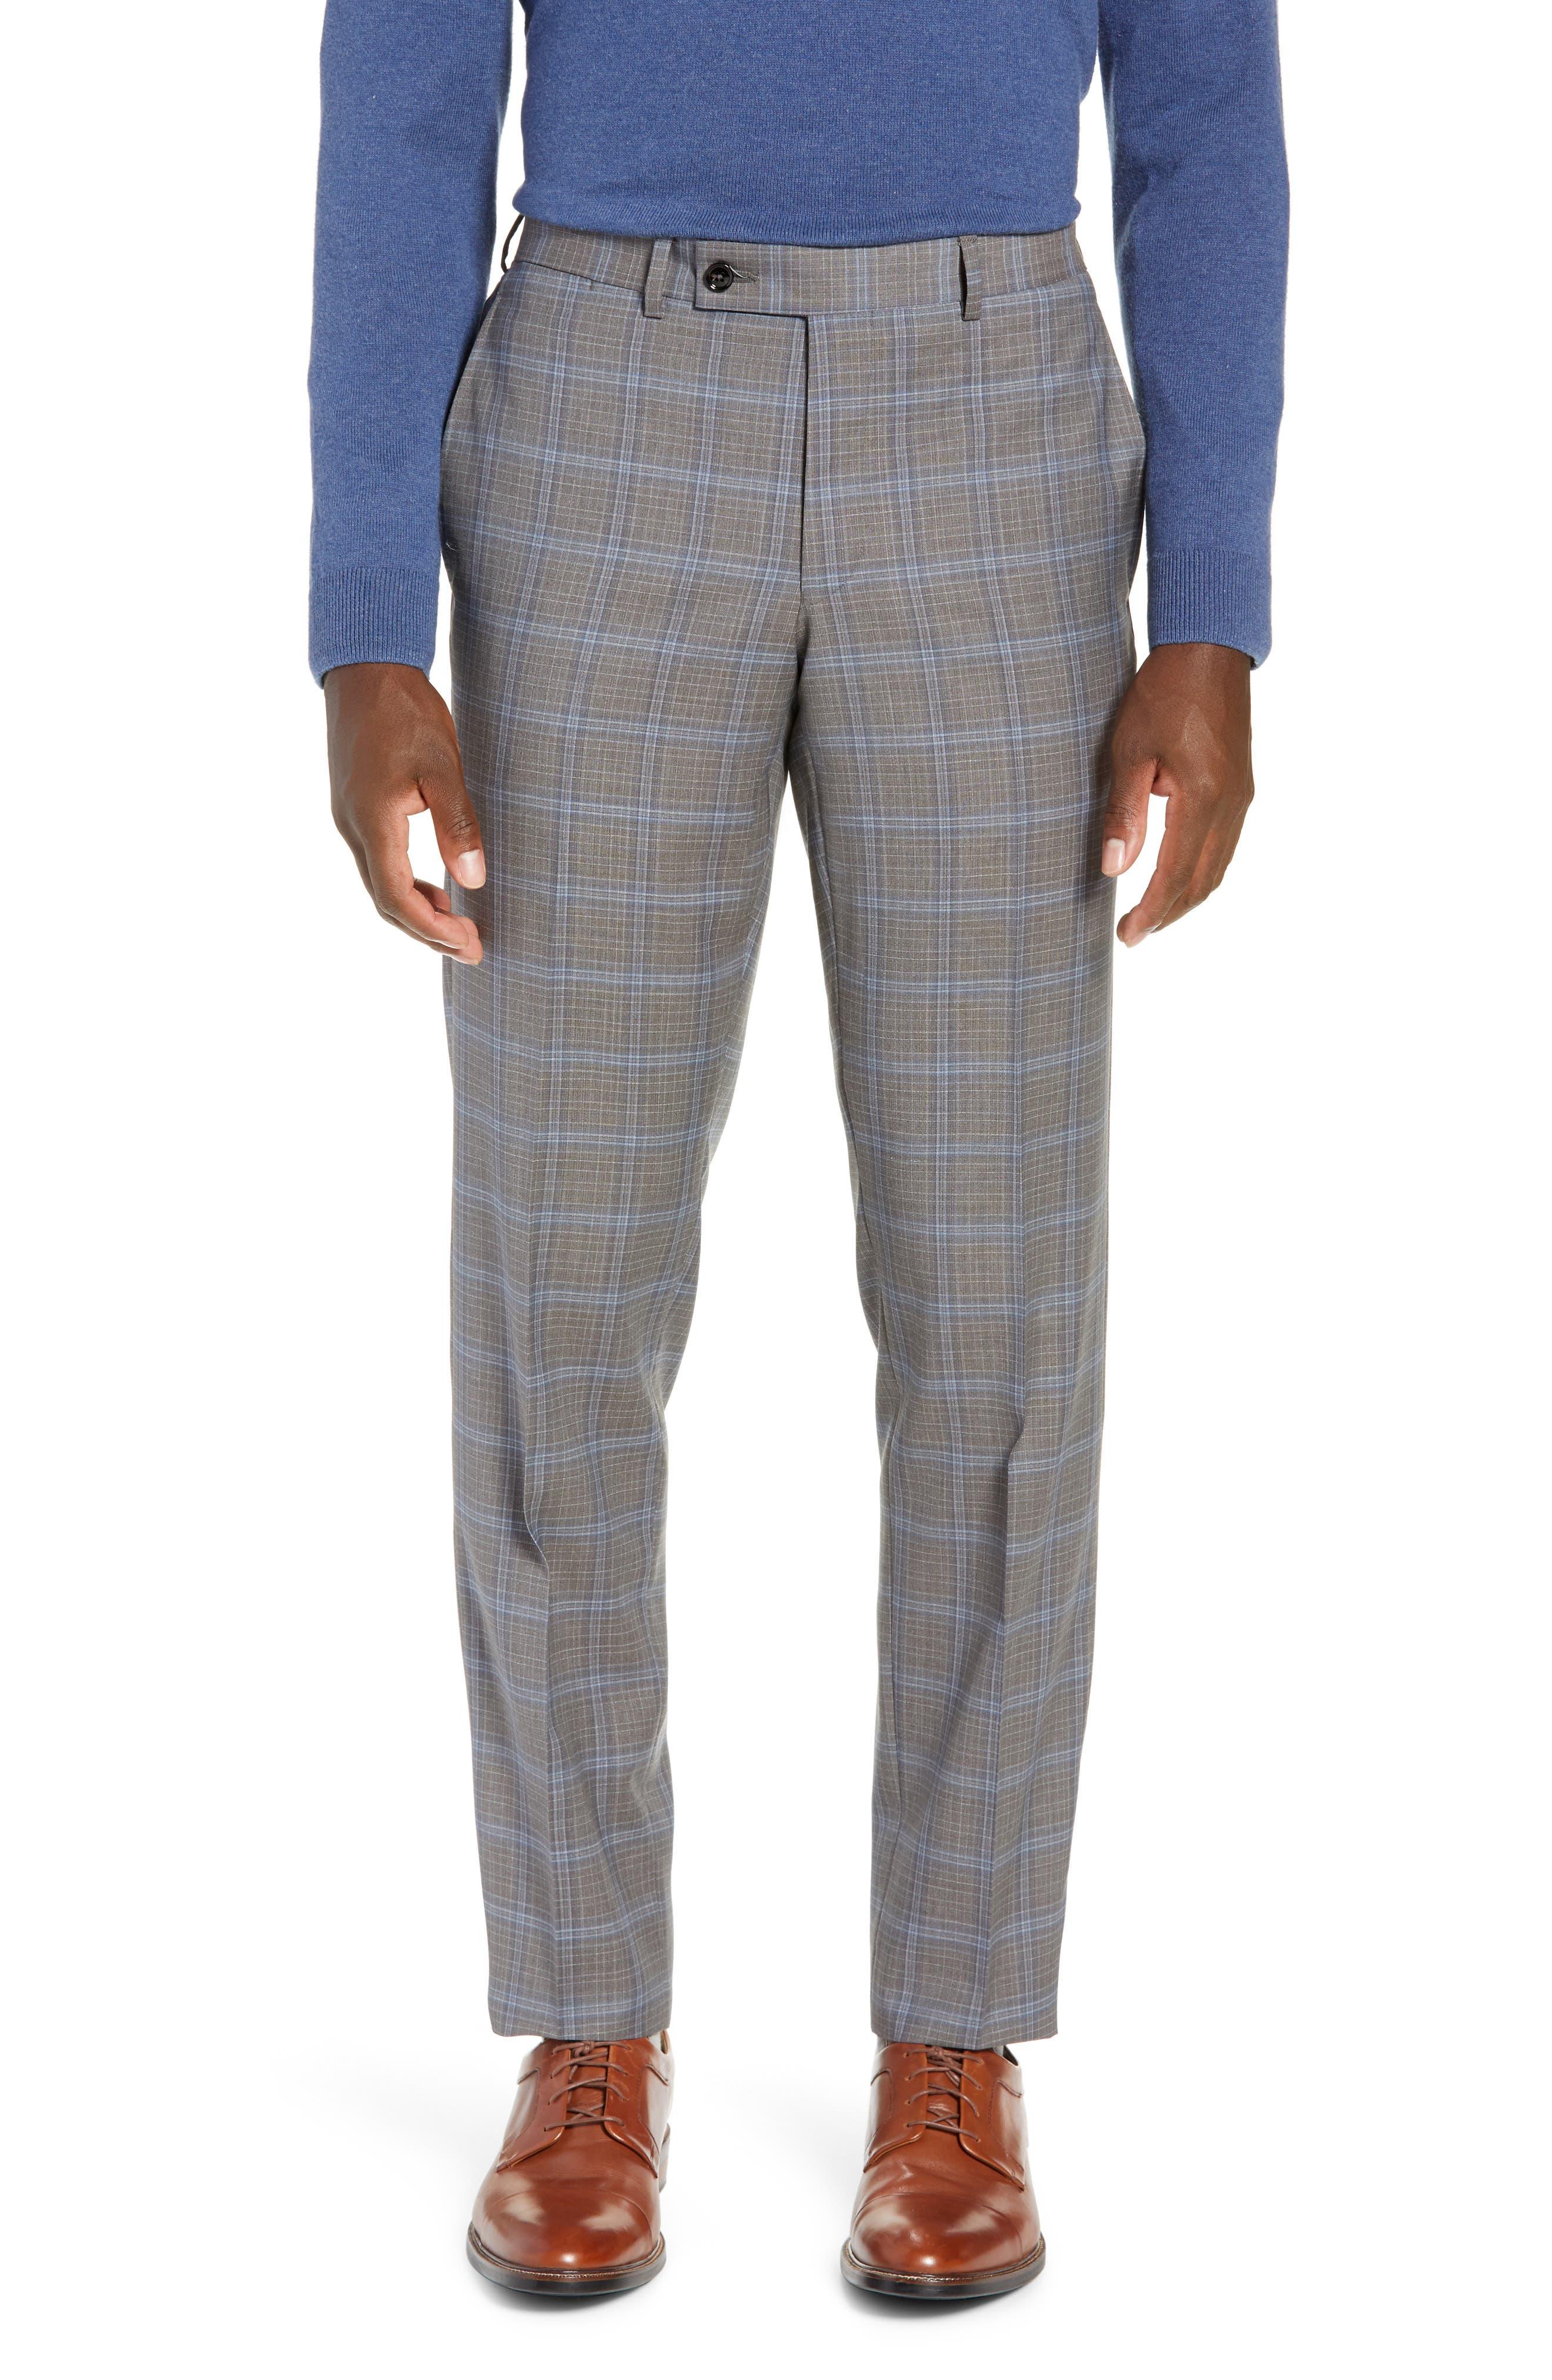 TED BAKER LONDON, Jay Trim Fit Plaid Wool Suit, Alternate thumbnail 6, color, LIGHT GREY